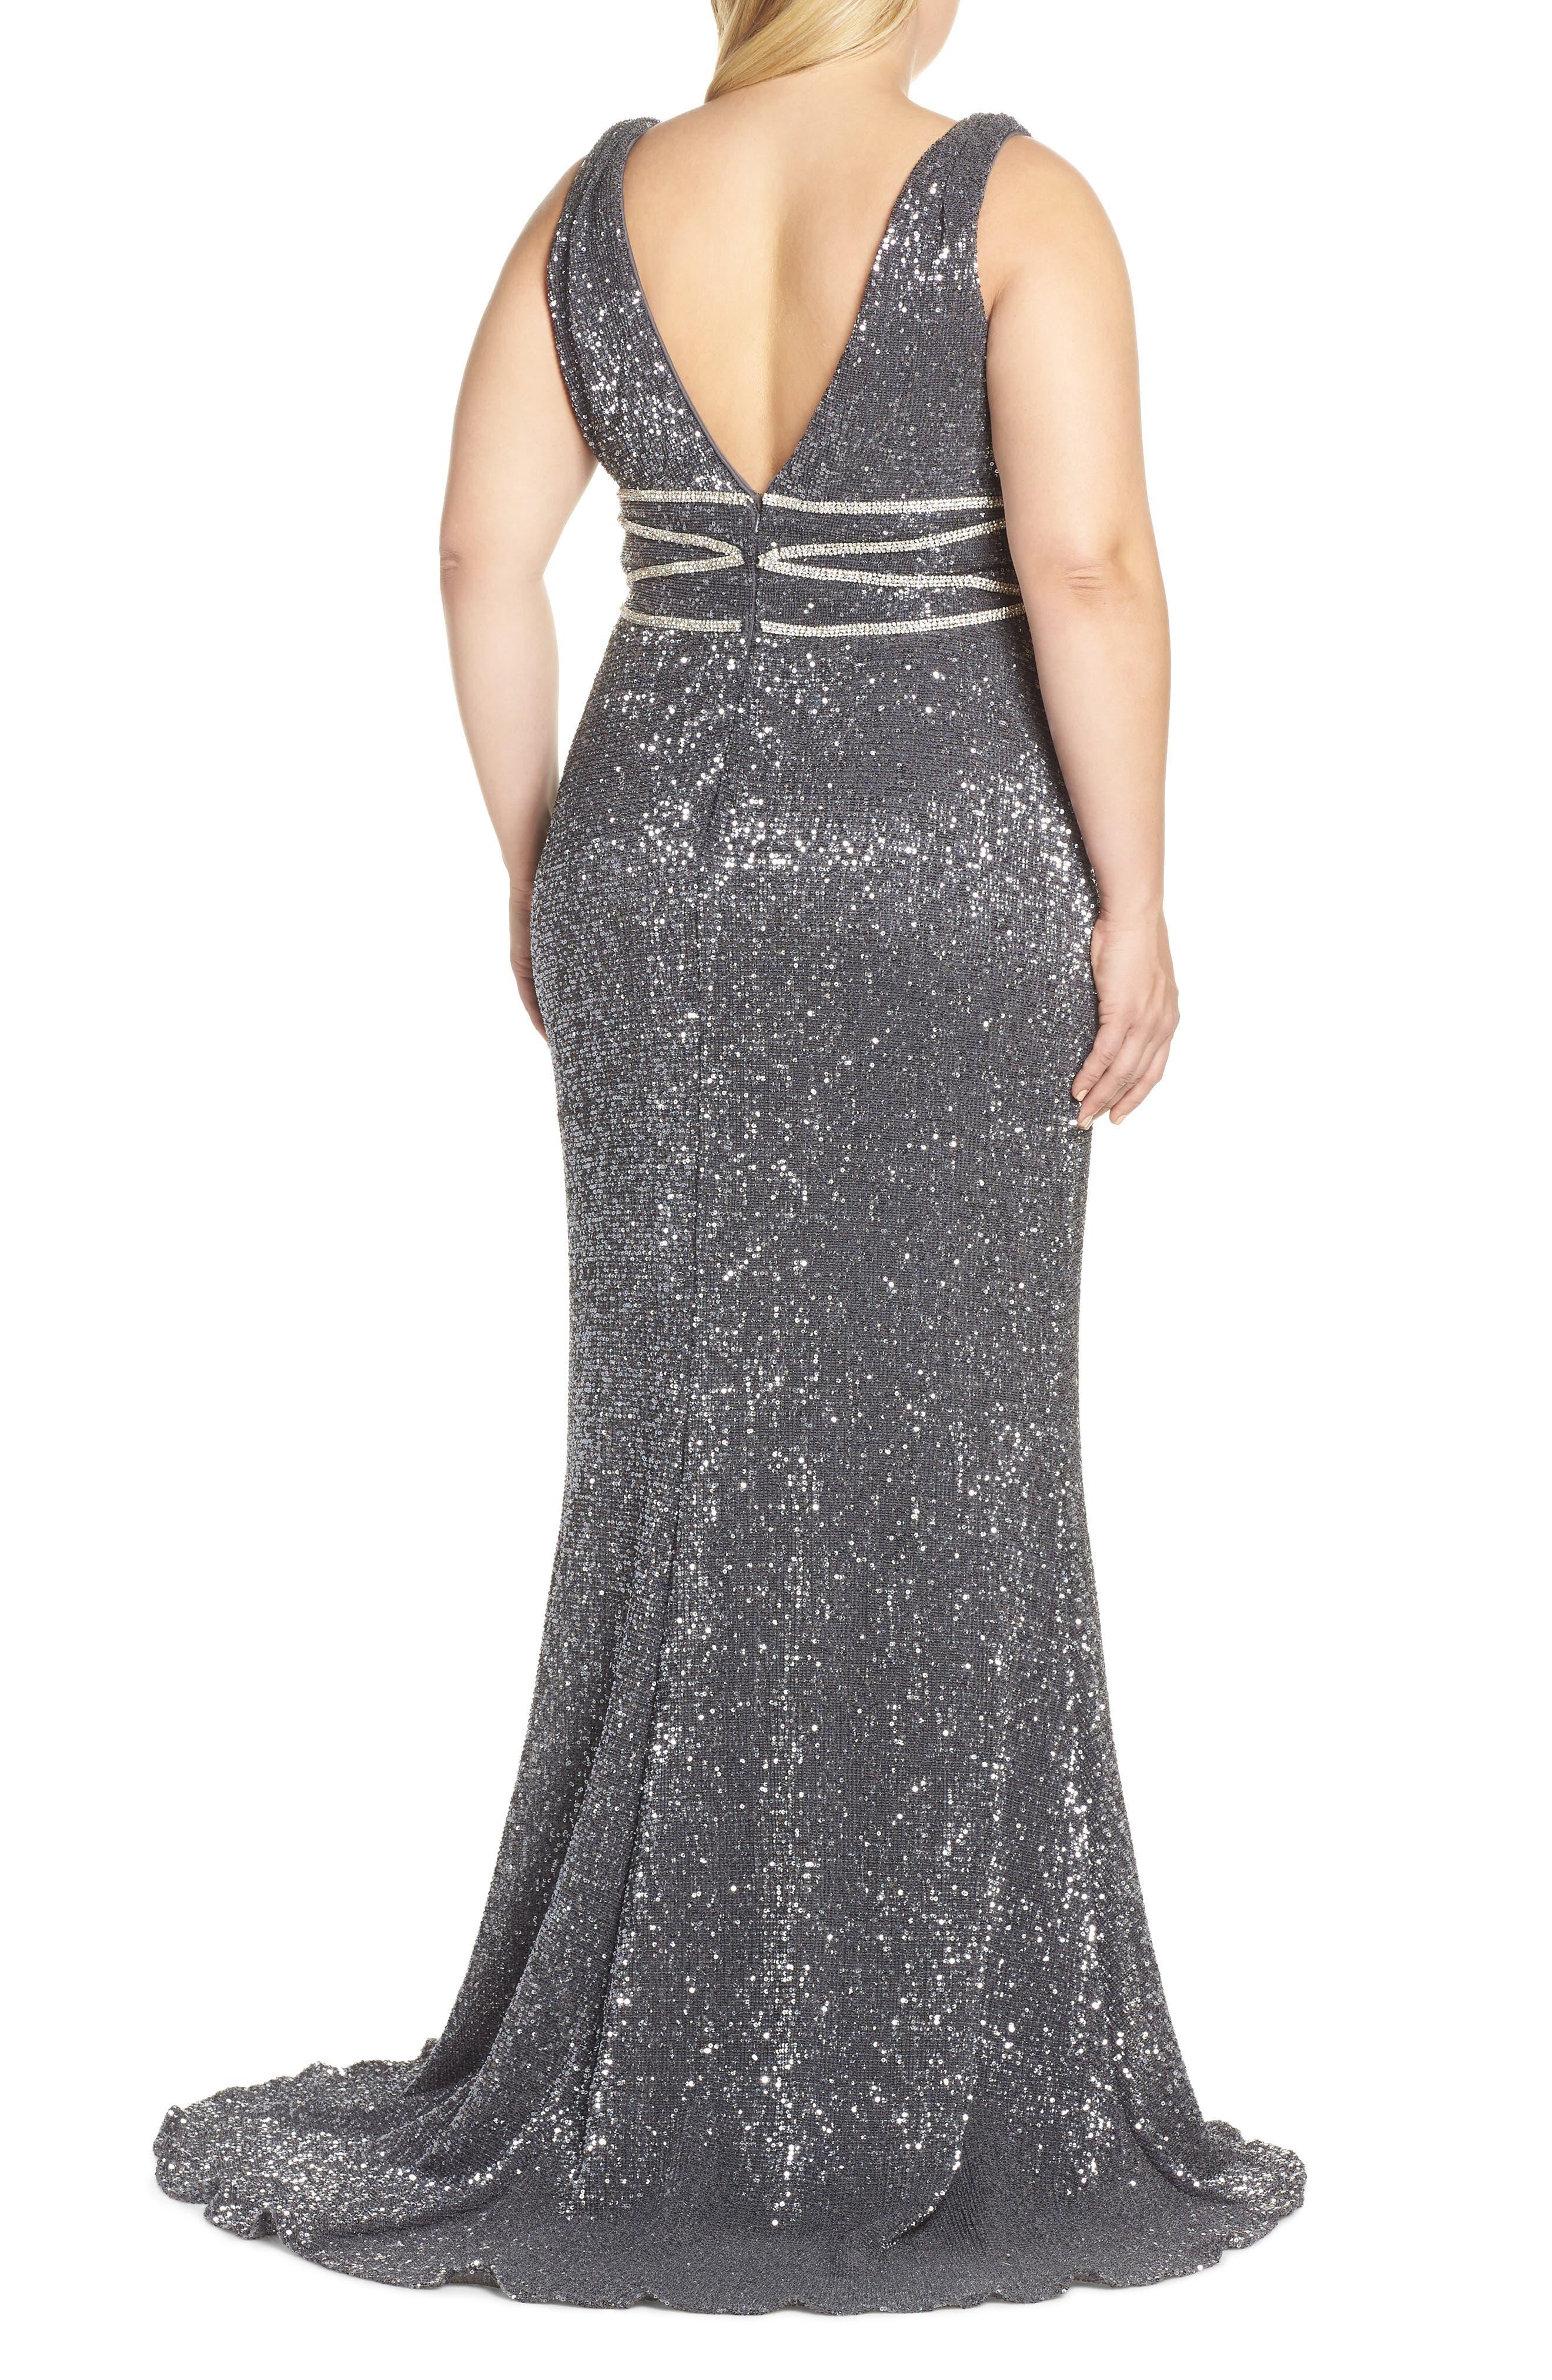 MAC DUGGAL, Beaded Waist Sequin Evening Dress, Alternate thumbnail 2, color, CHARCOAL